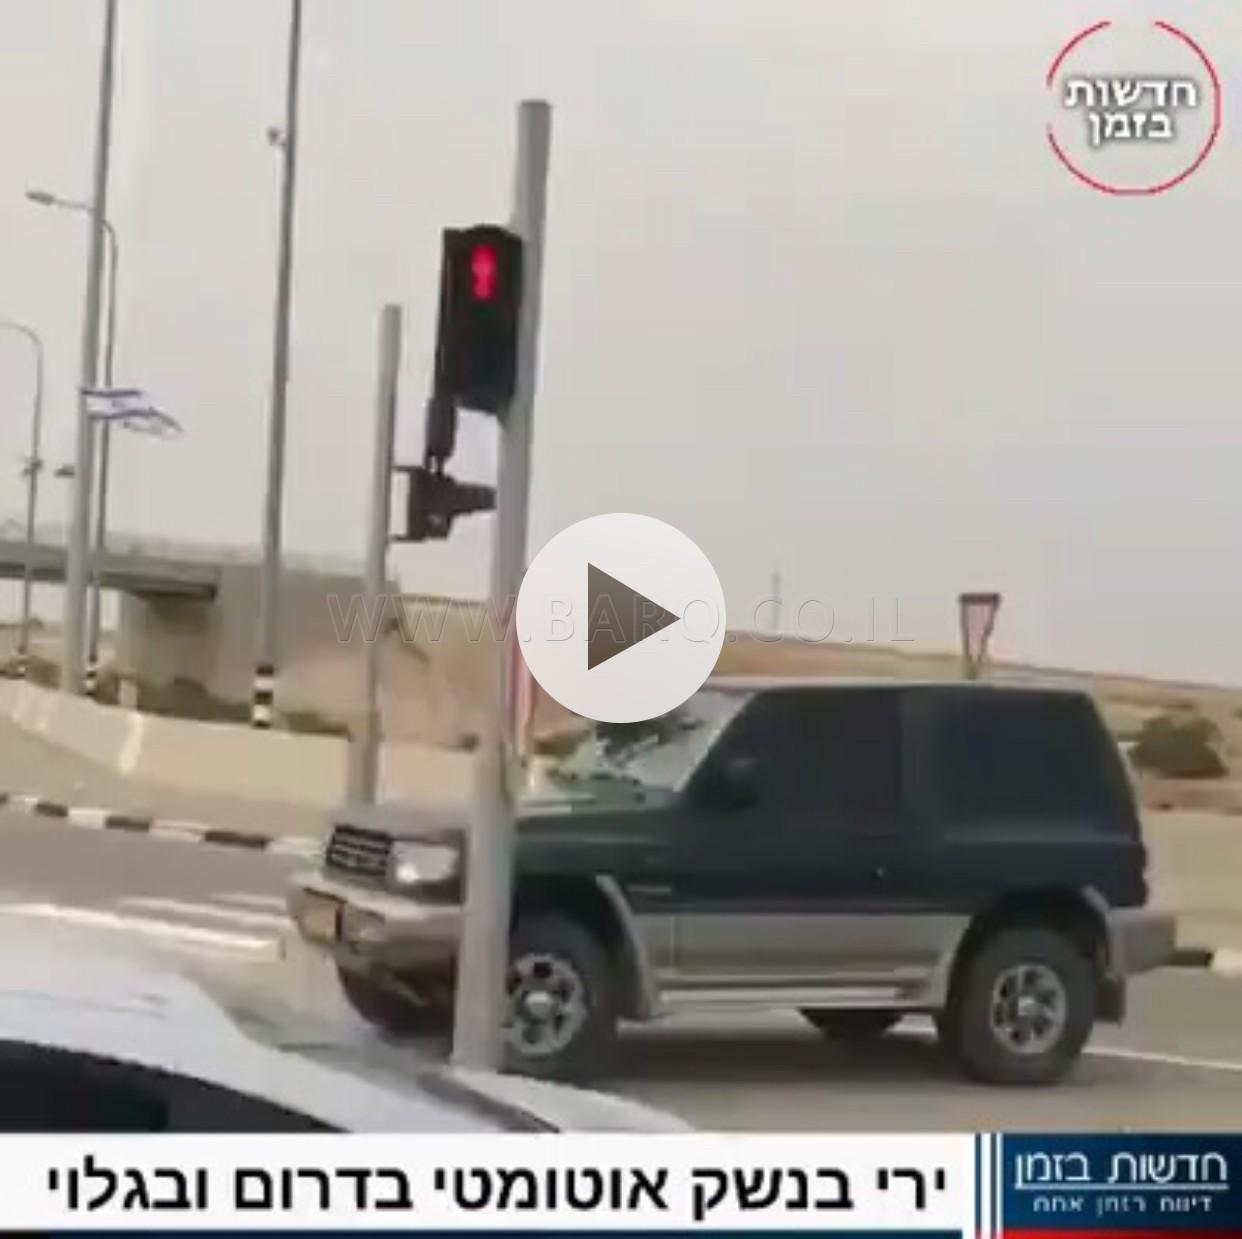 Photo of فيديو يوثّق لحظات إطلاق نار في الجنوب من قبل ملثمين خلال زفّة